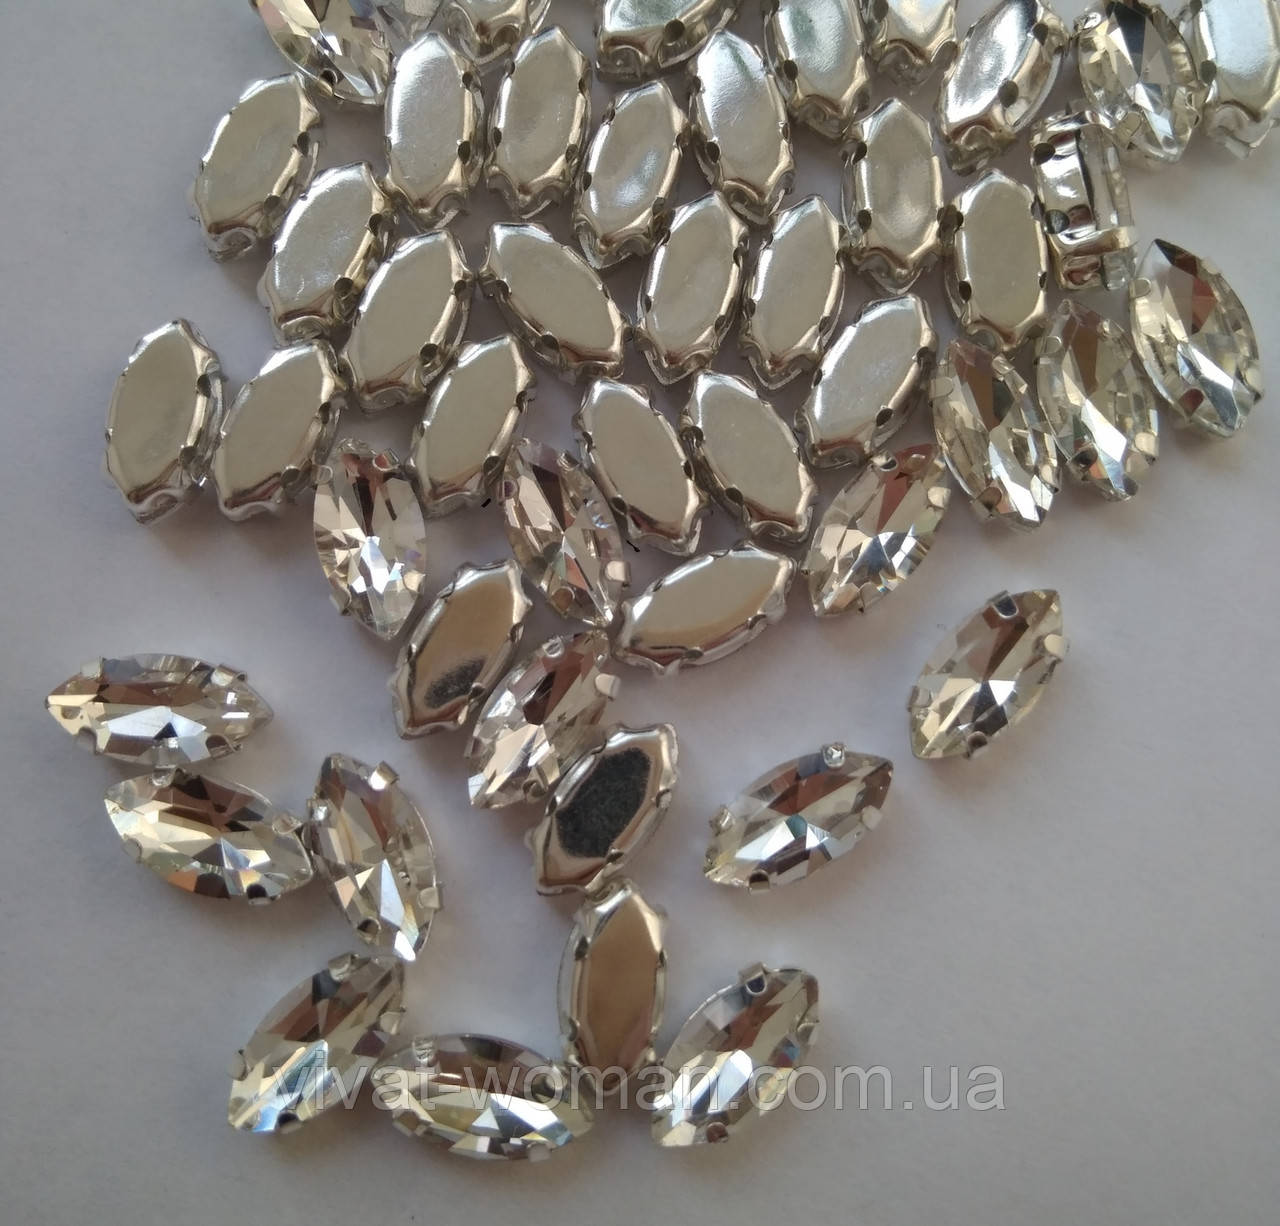 Стрази в цапах, Лодочка 6х12 мм, Crystal, скло, срібна оправа. Ціна за 1 шт